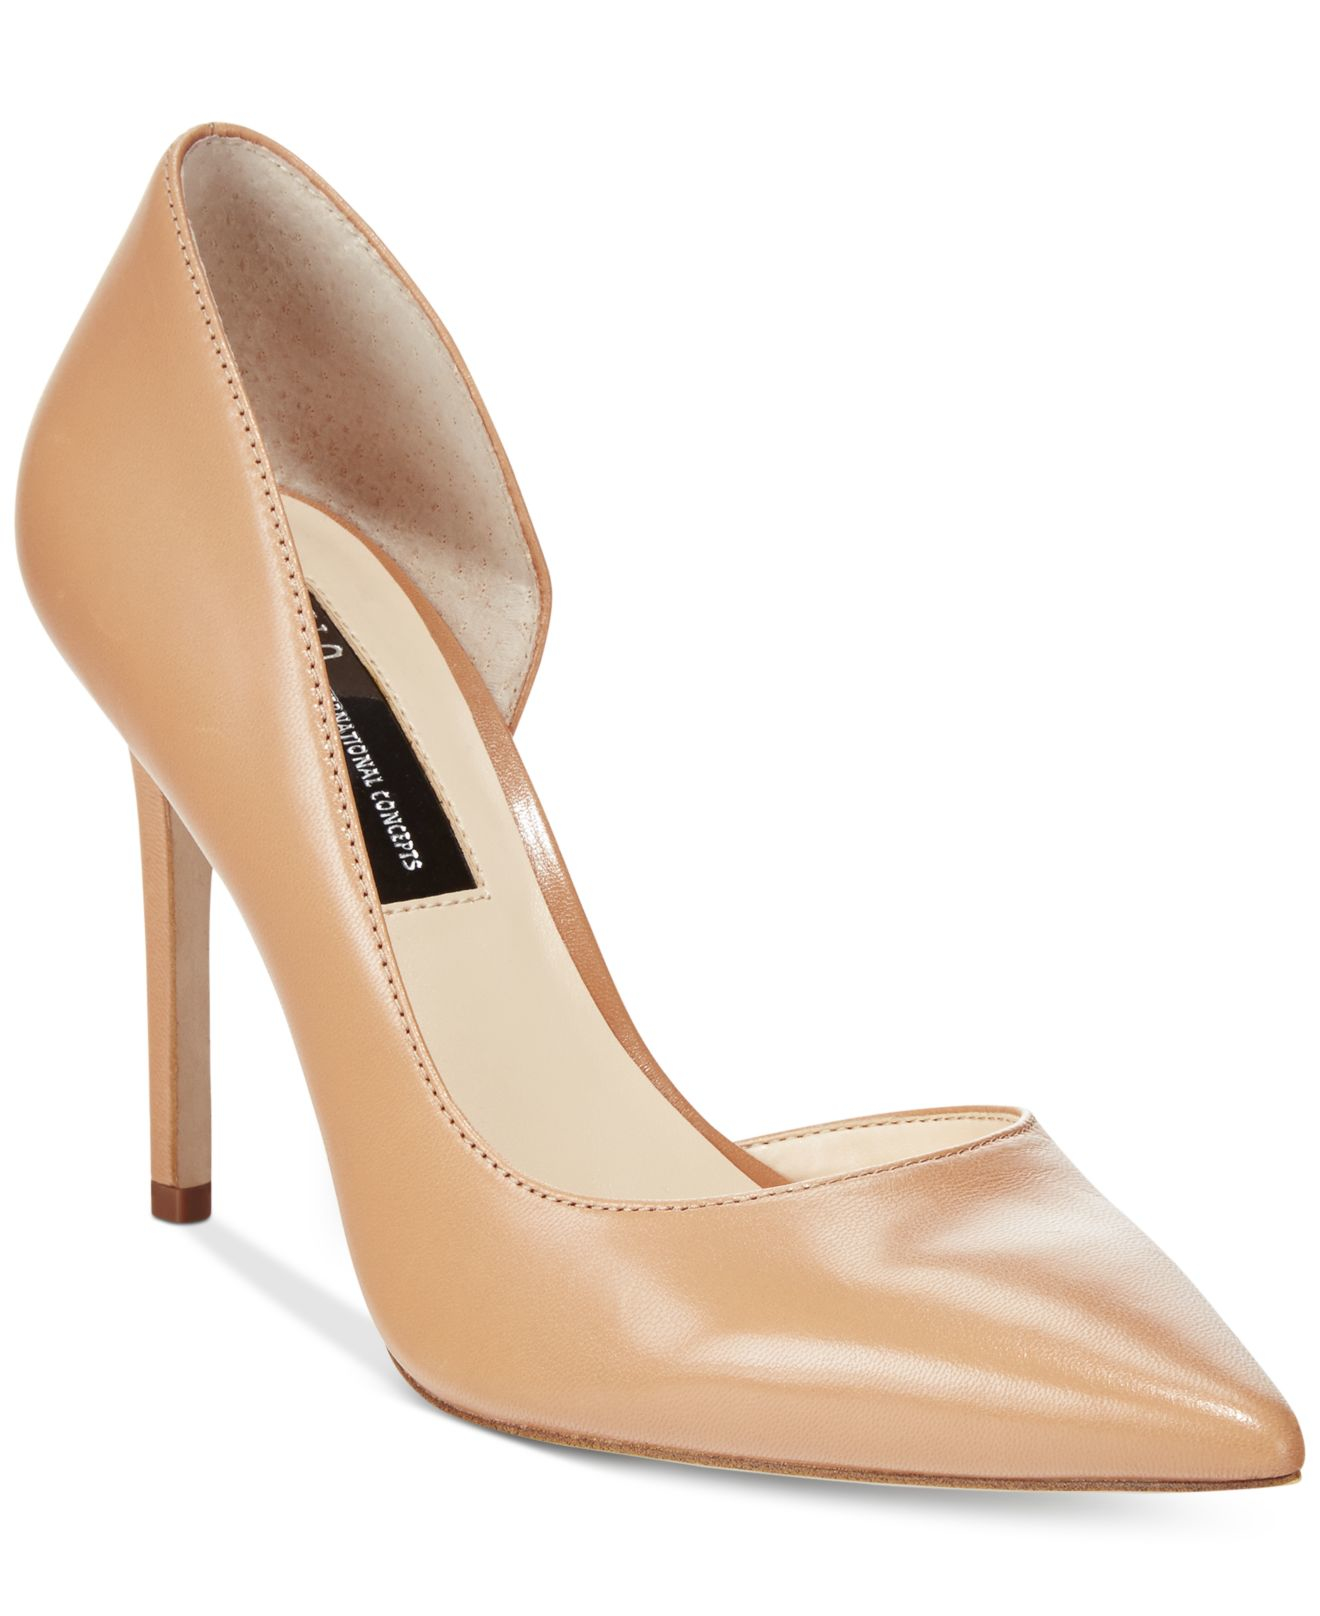 Inc Macy S Shoes